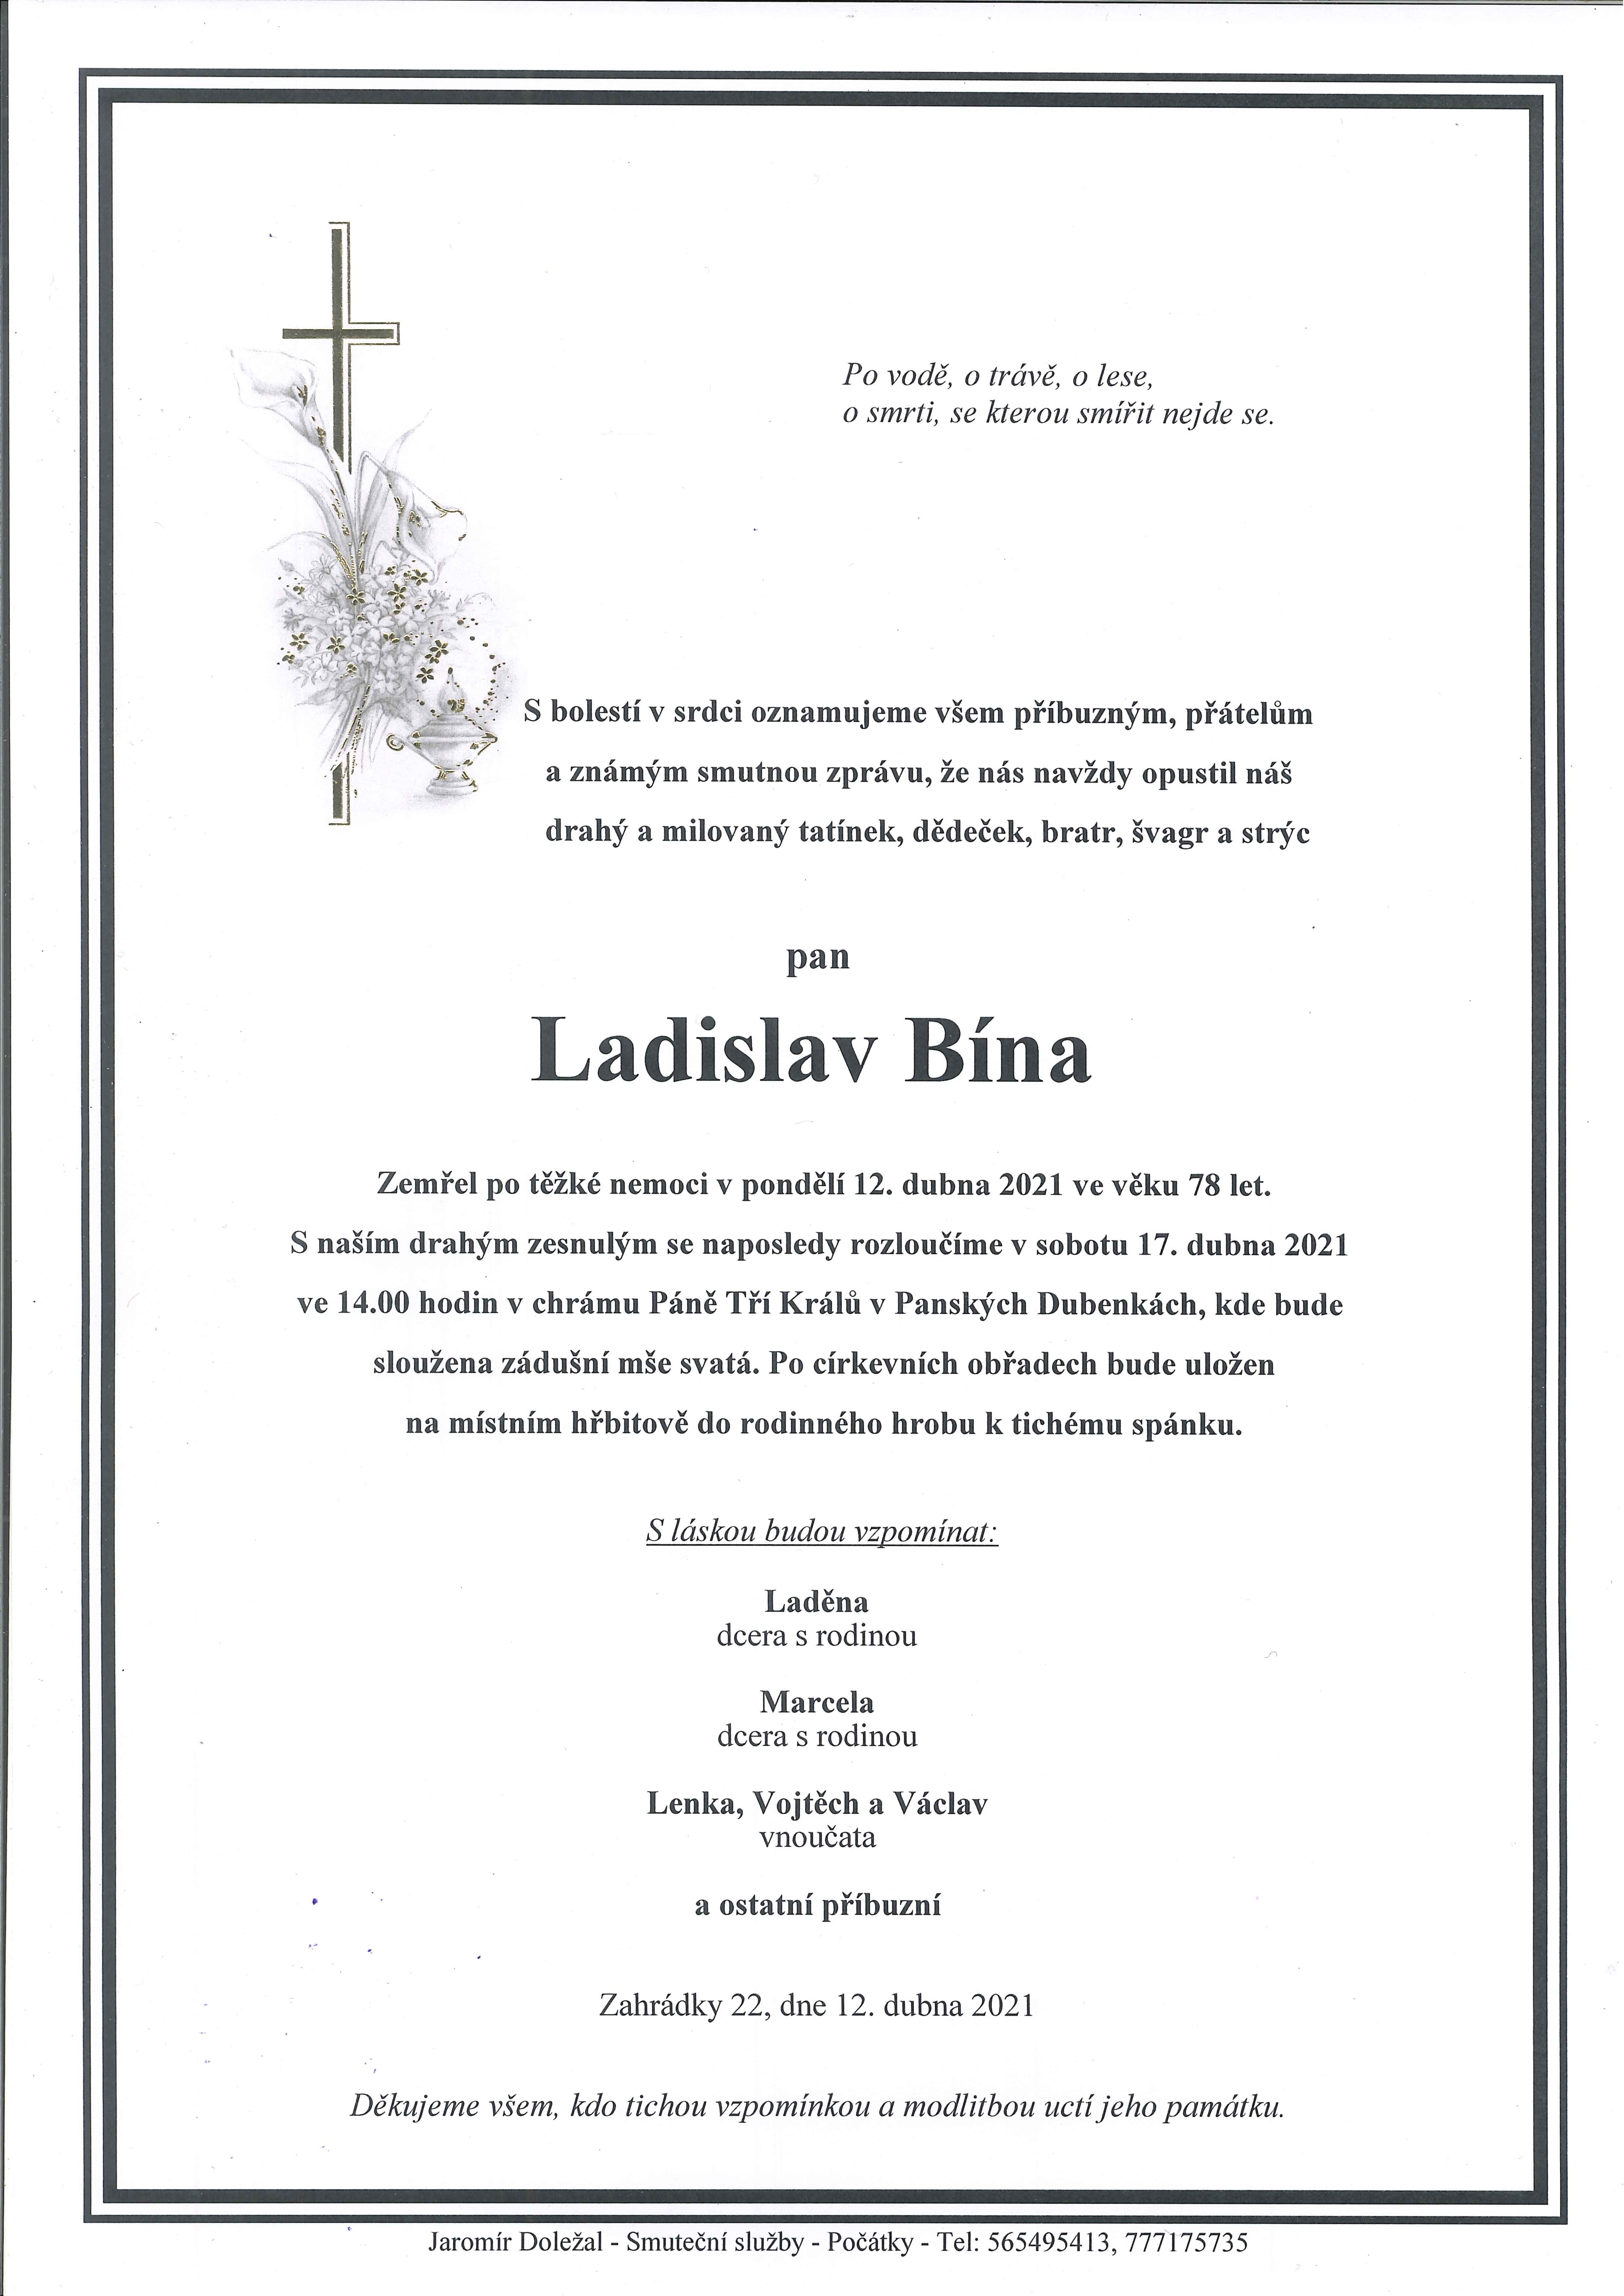 Ladislav Bína